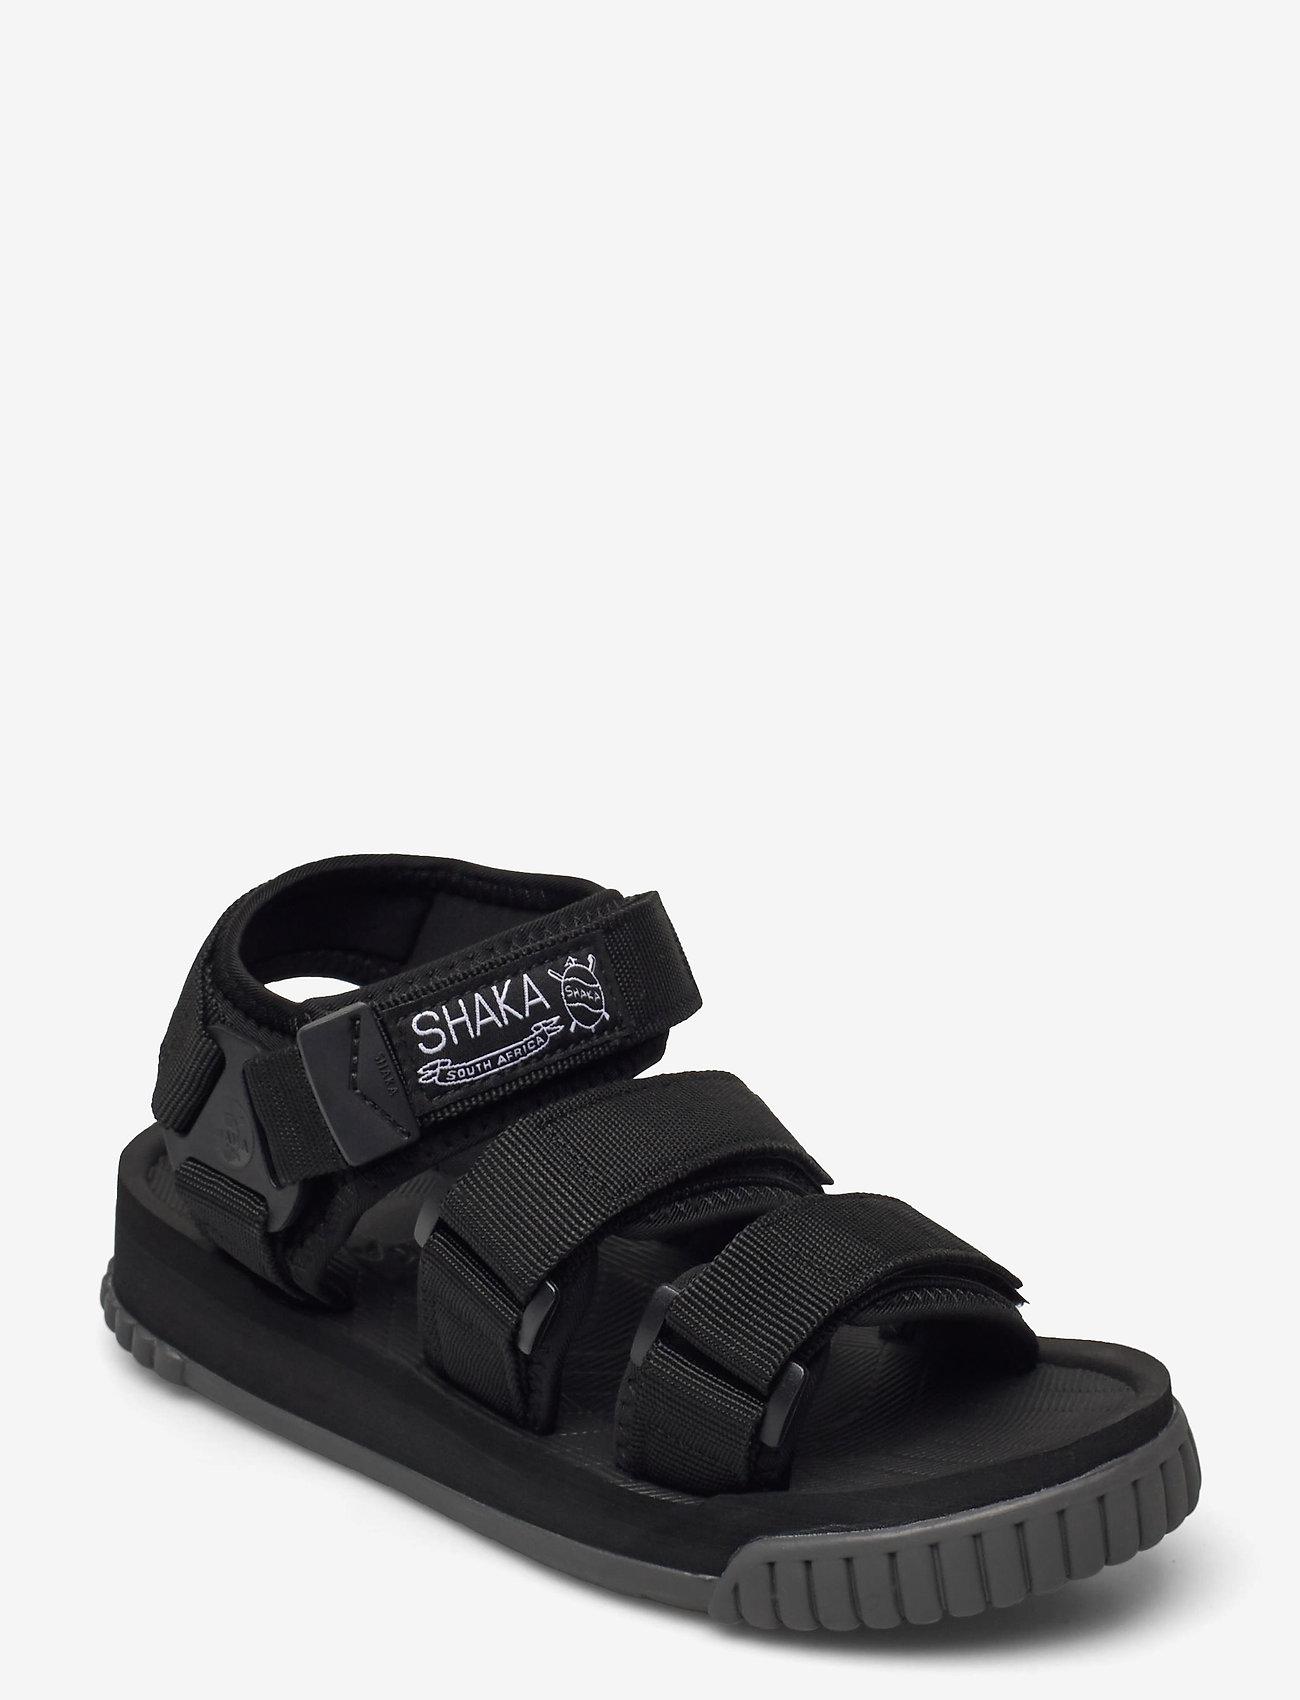 Shaka - Neo Bungy - platta sandaler - black/charcoal - 0